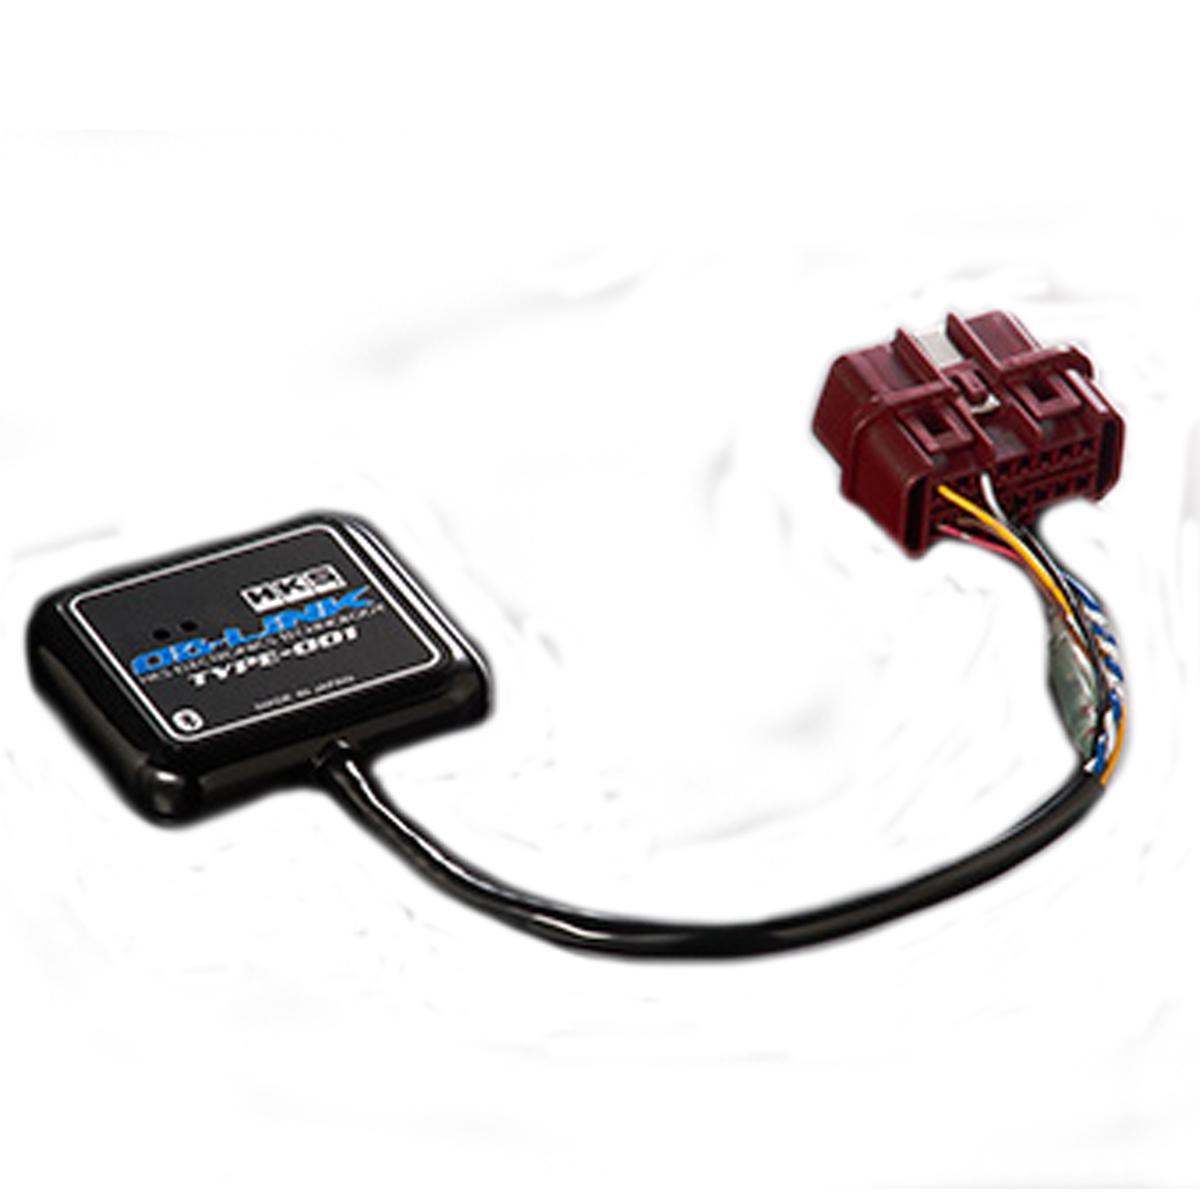 BMW モニター OBリンク タイプ 001 1A16 HKS 44009-AK002 エレクトリニクス 個人宅発送追金有